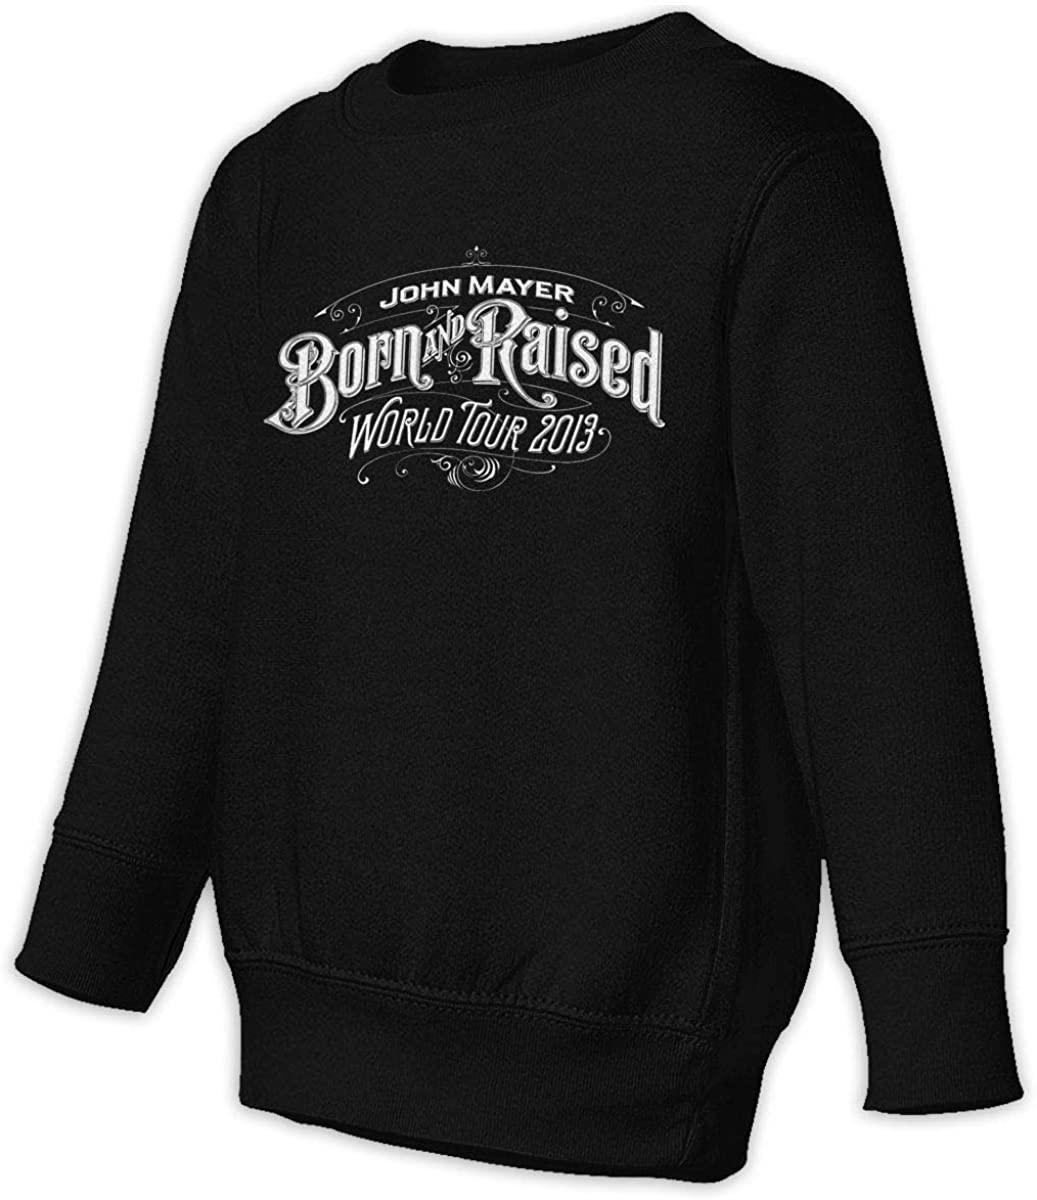 ASDFNLSF John Mayer Unisex Sweatshirt Youth Boy and Girls Pullover Sweatshirt